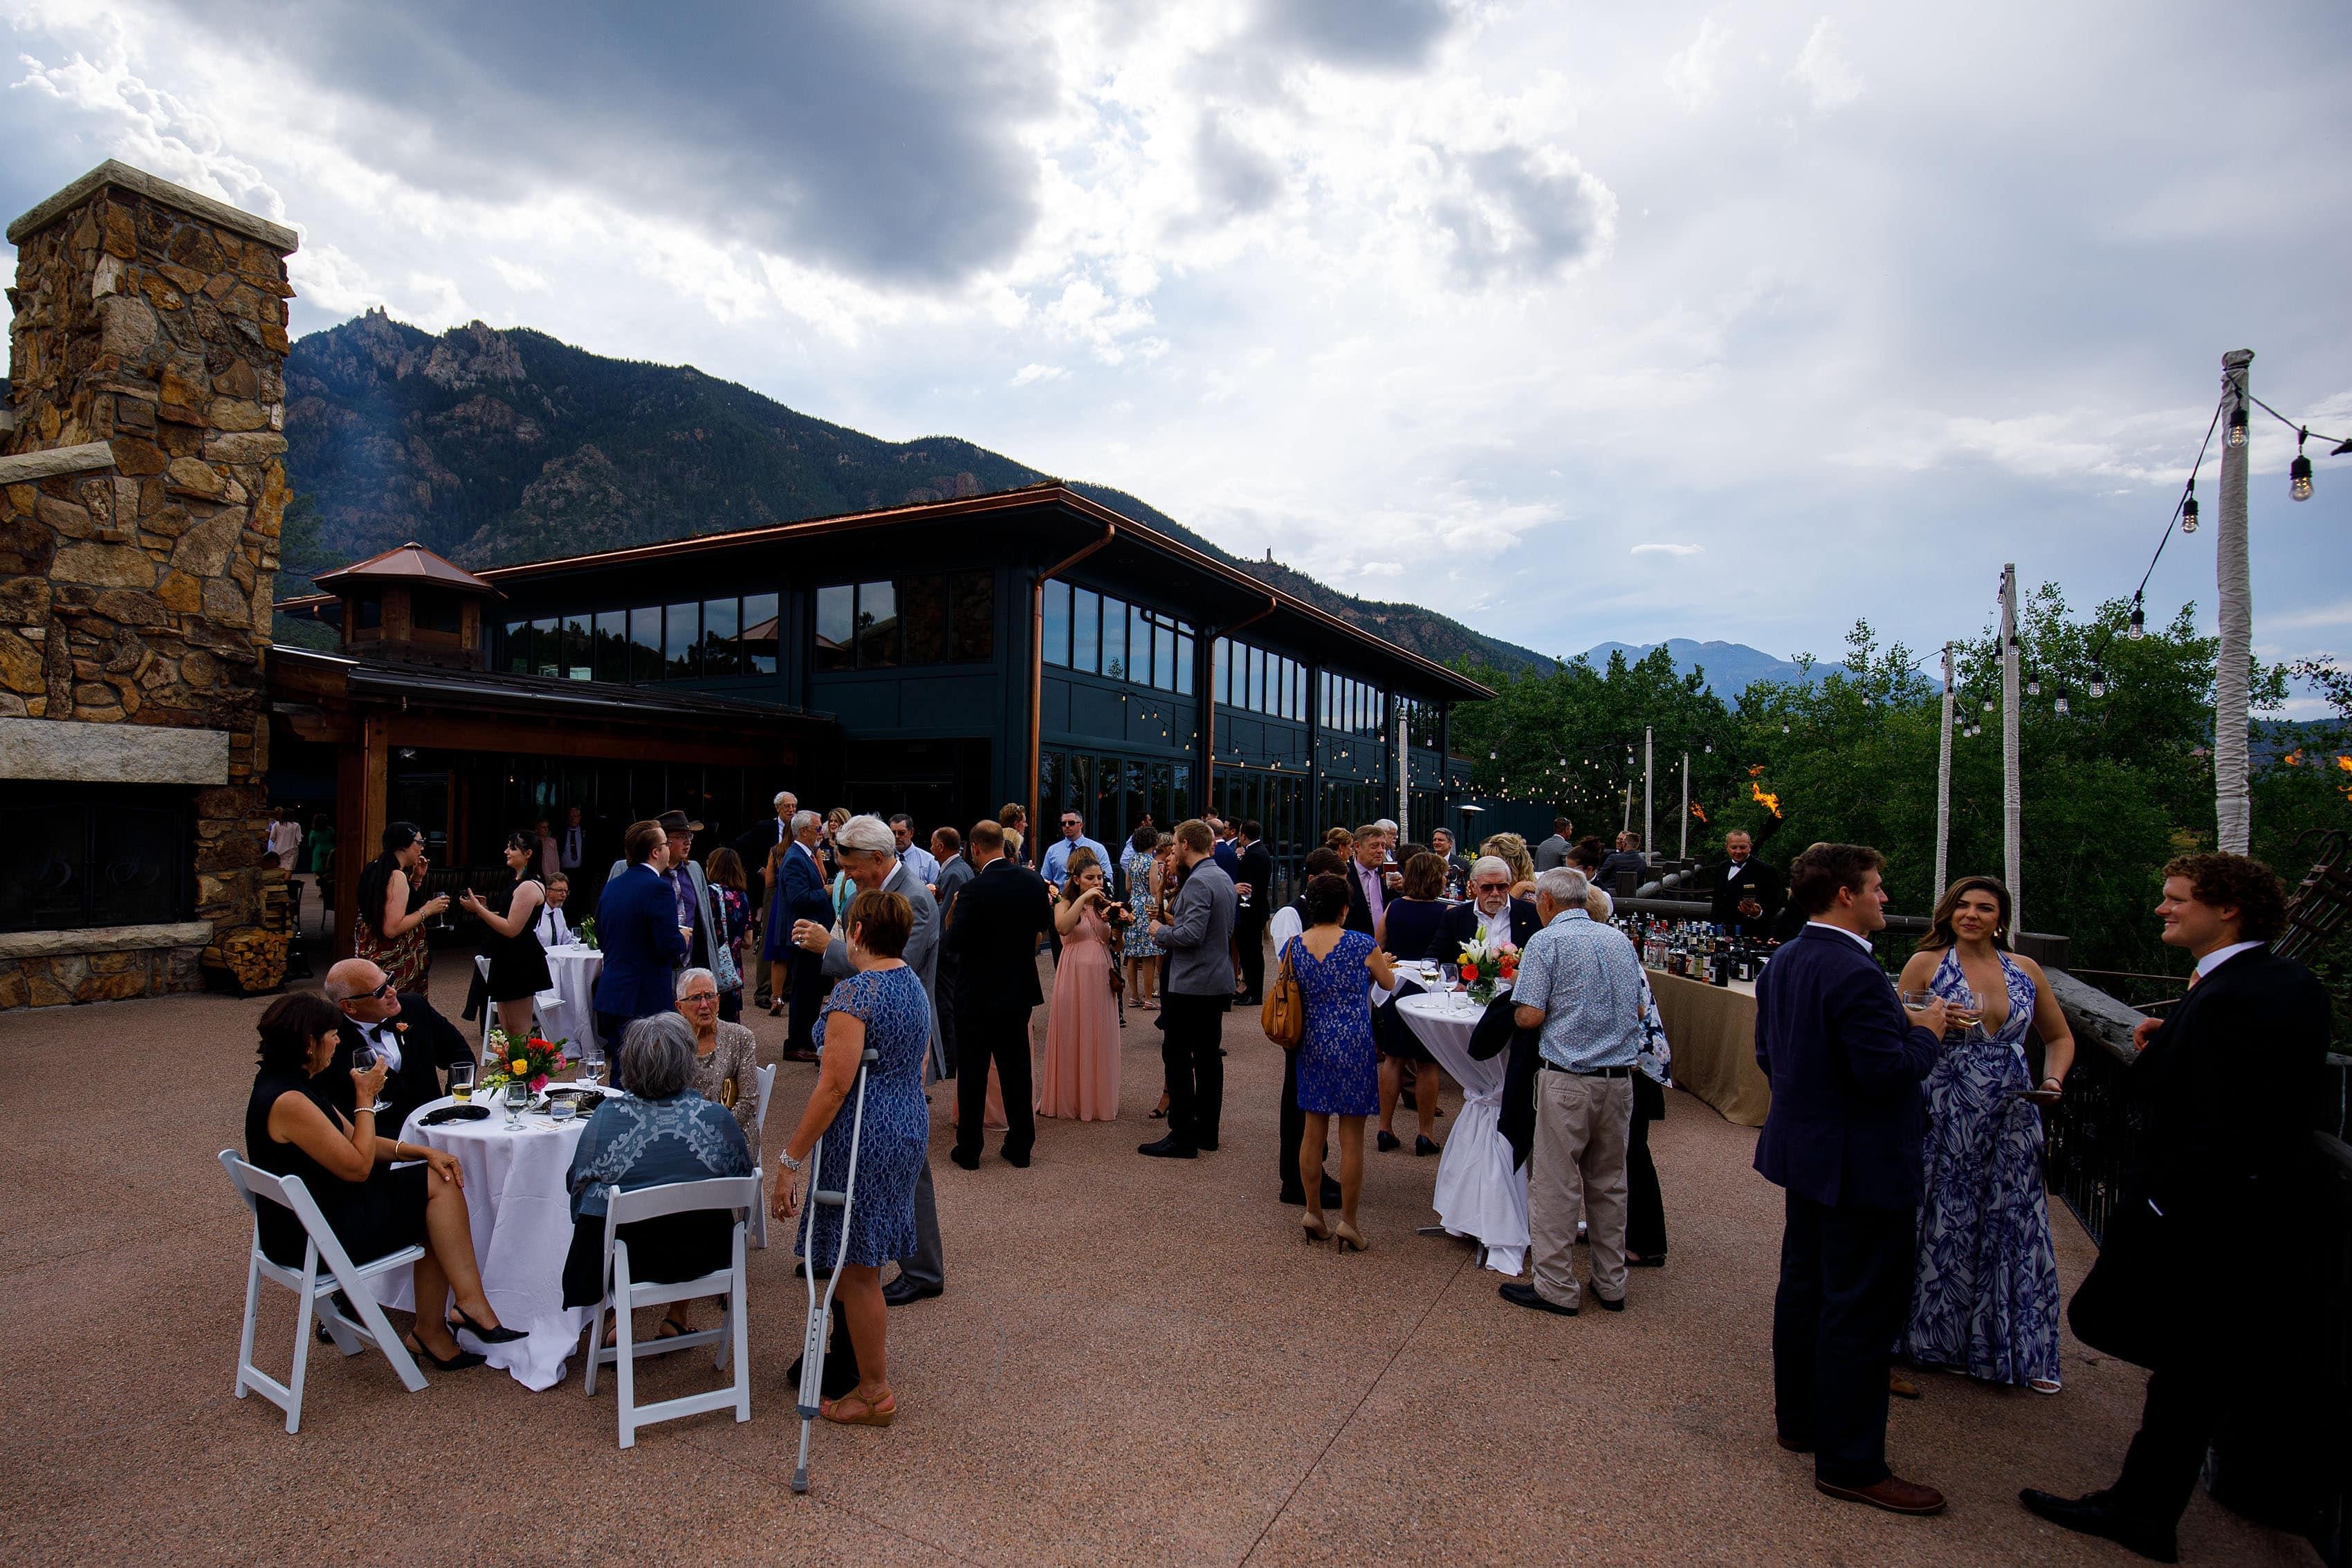 Cheyenne Lodge wedding venue at The Broadmoor